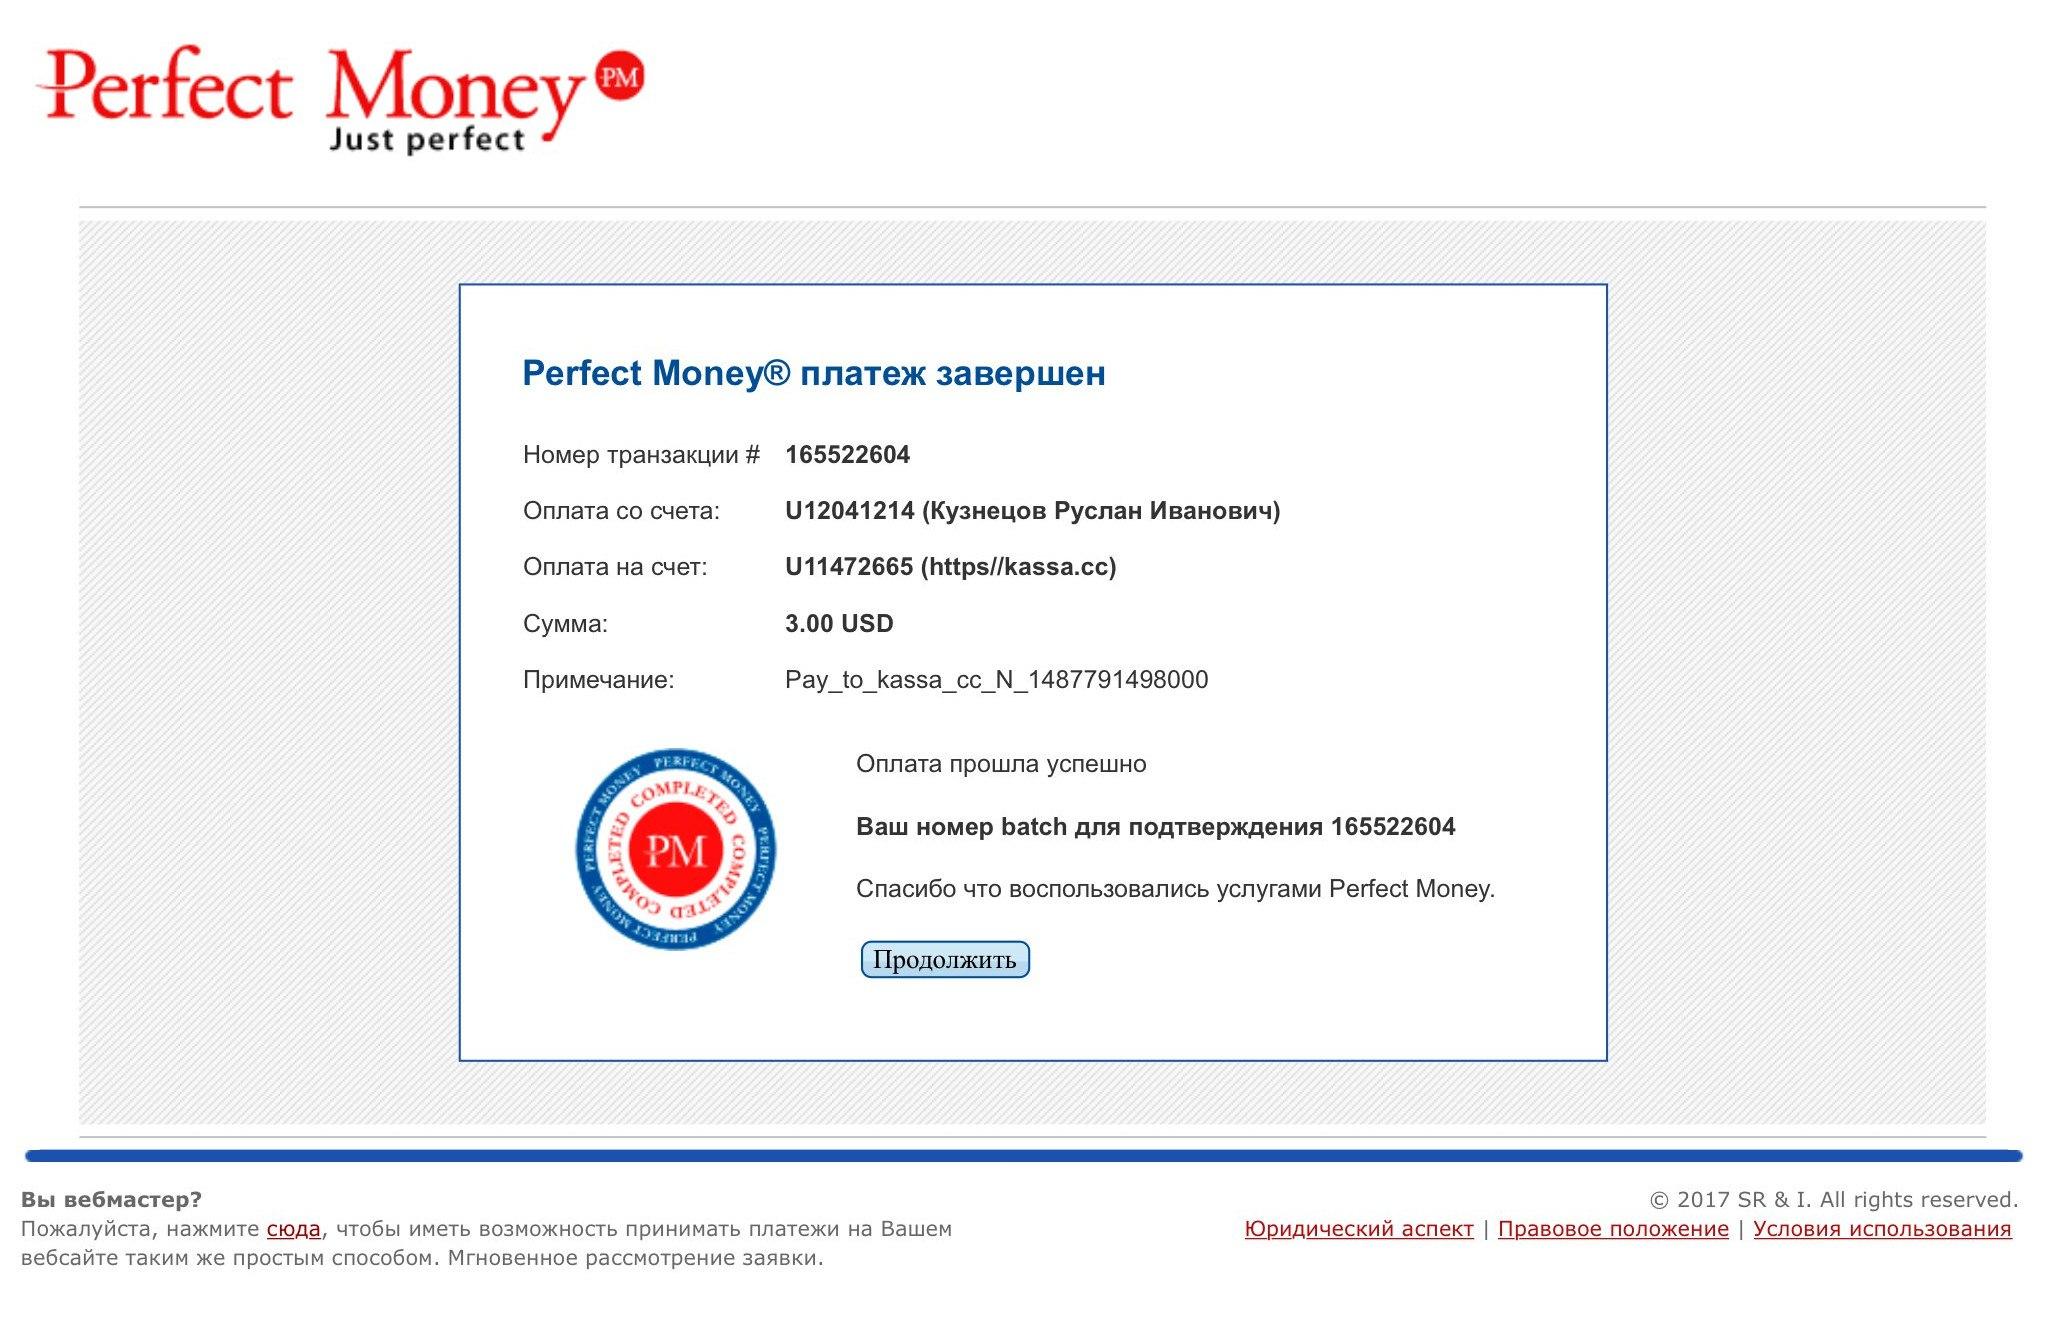 Kassa.cc - единый обмен валюты. Обмен Perfect Money USD на Яндекс.Деньги